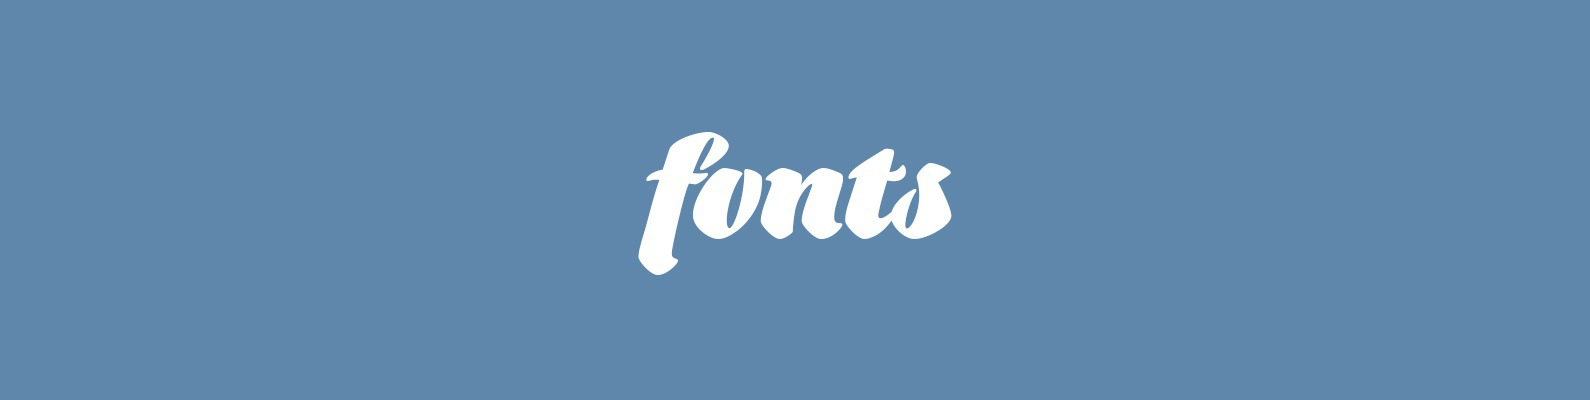 Fonts / Шрифты   ВКонтакте